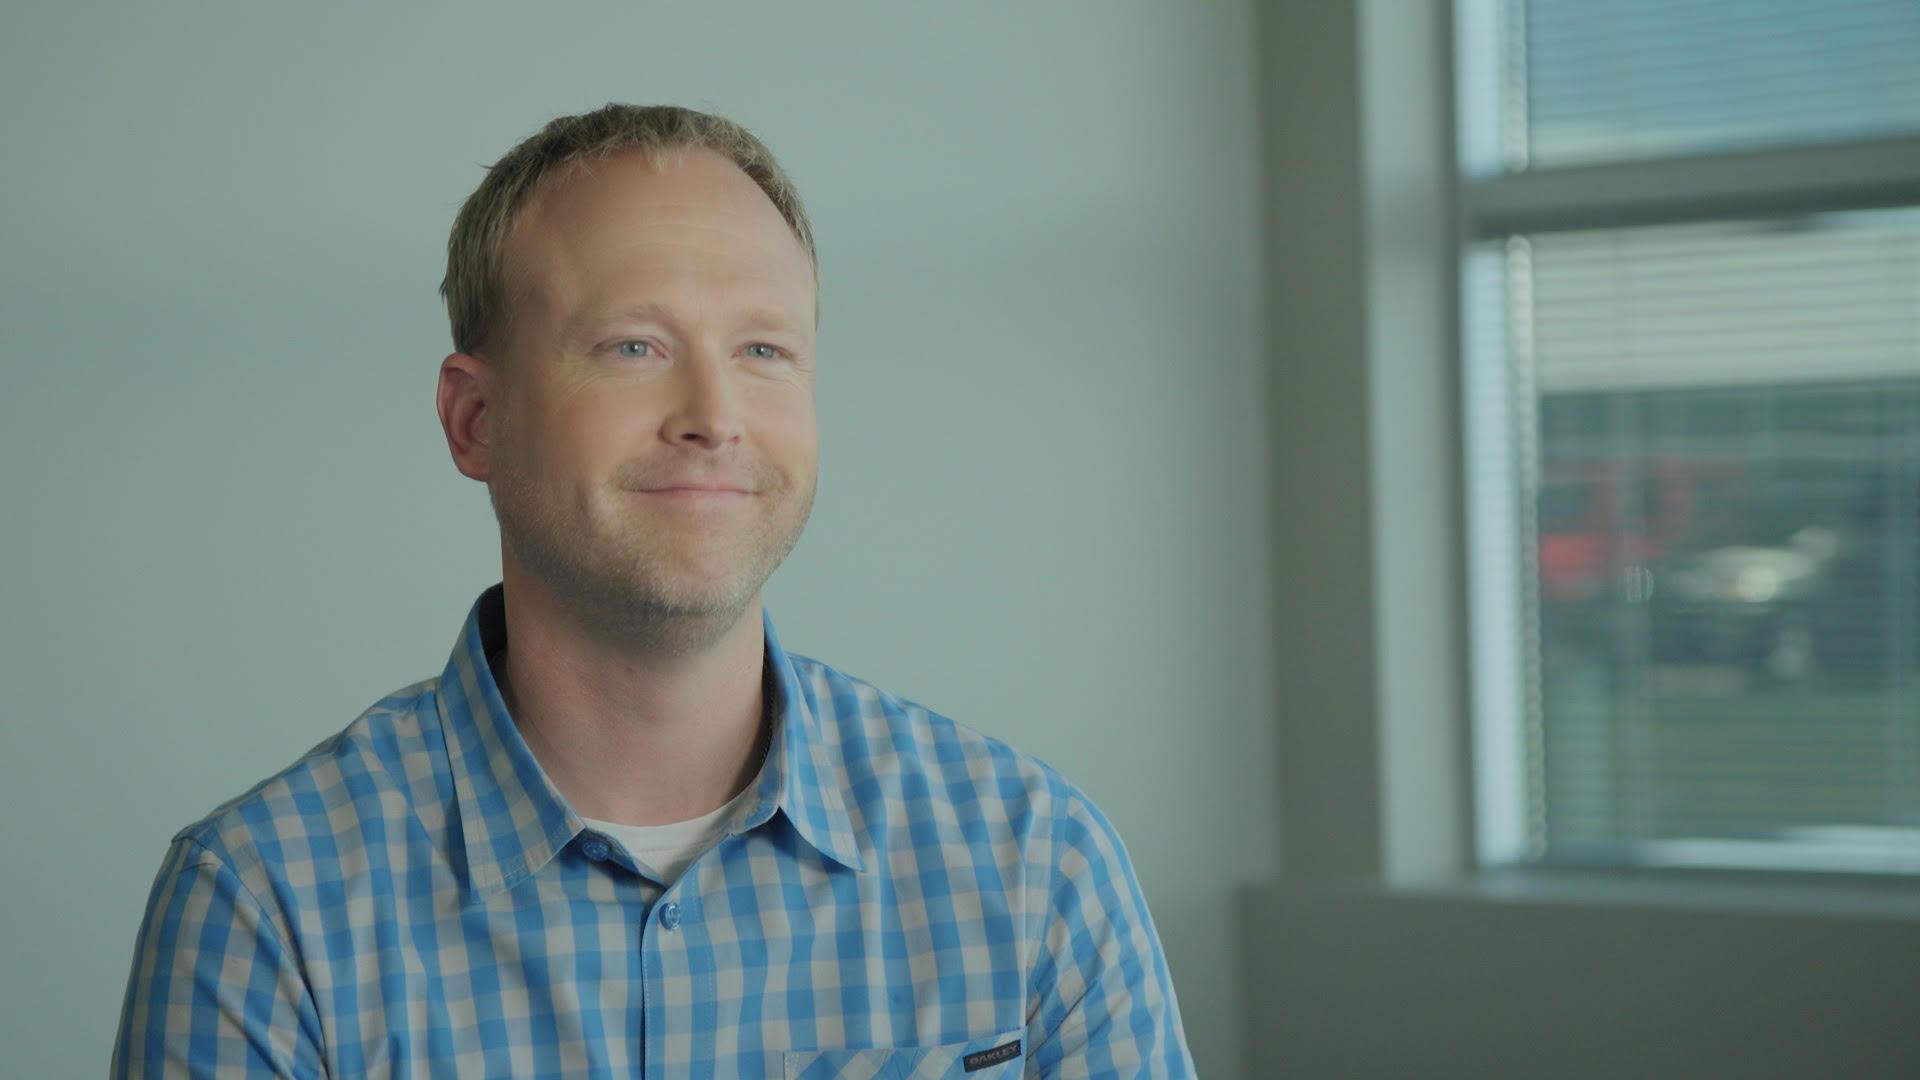 Joe Riesberg, vicepresidente de Tecnología en DHI Group, Inc.